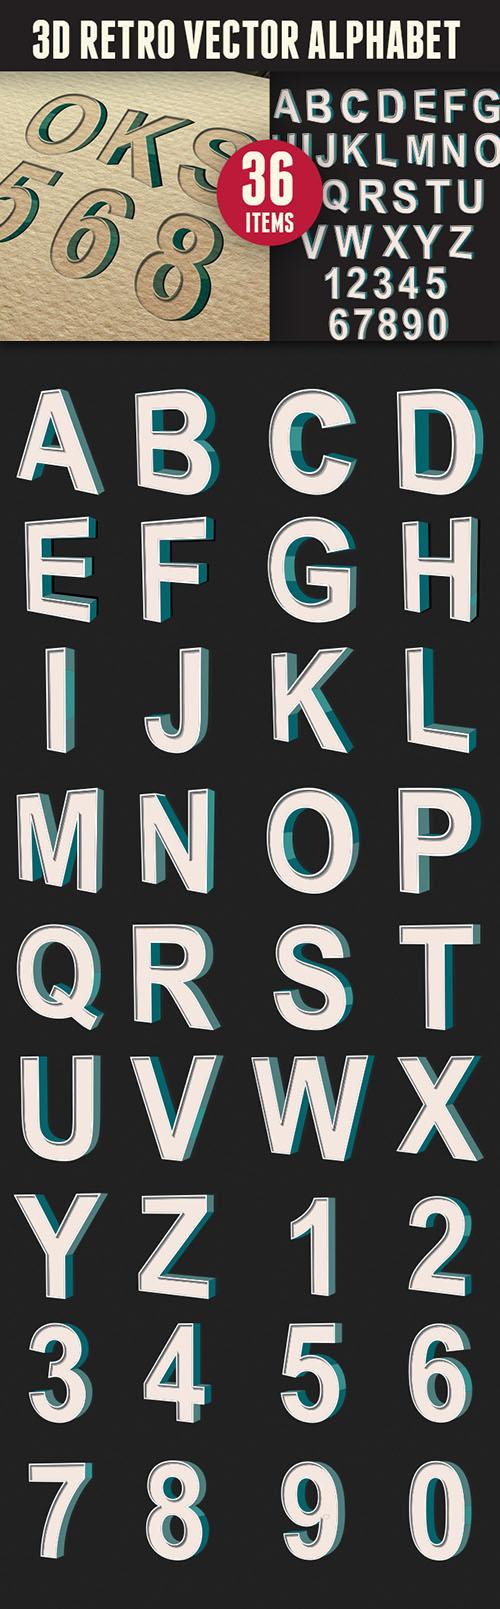 3D Retro Vector Alphabet